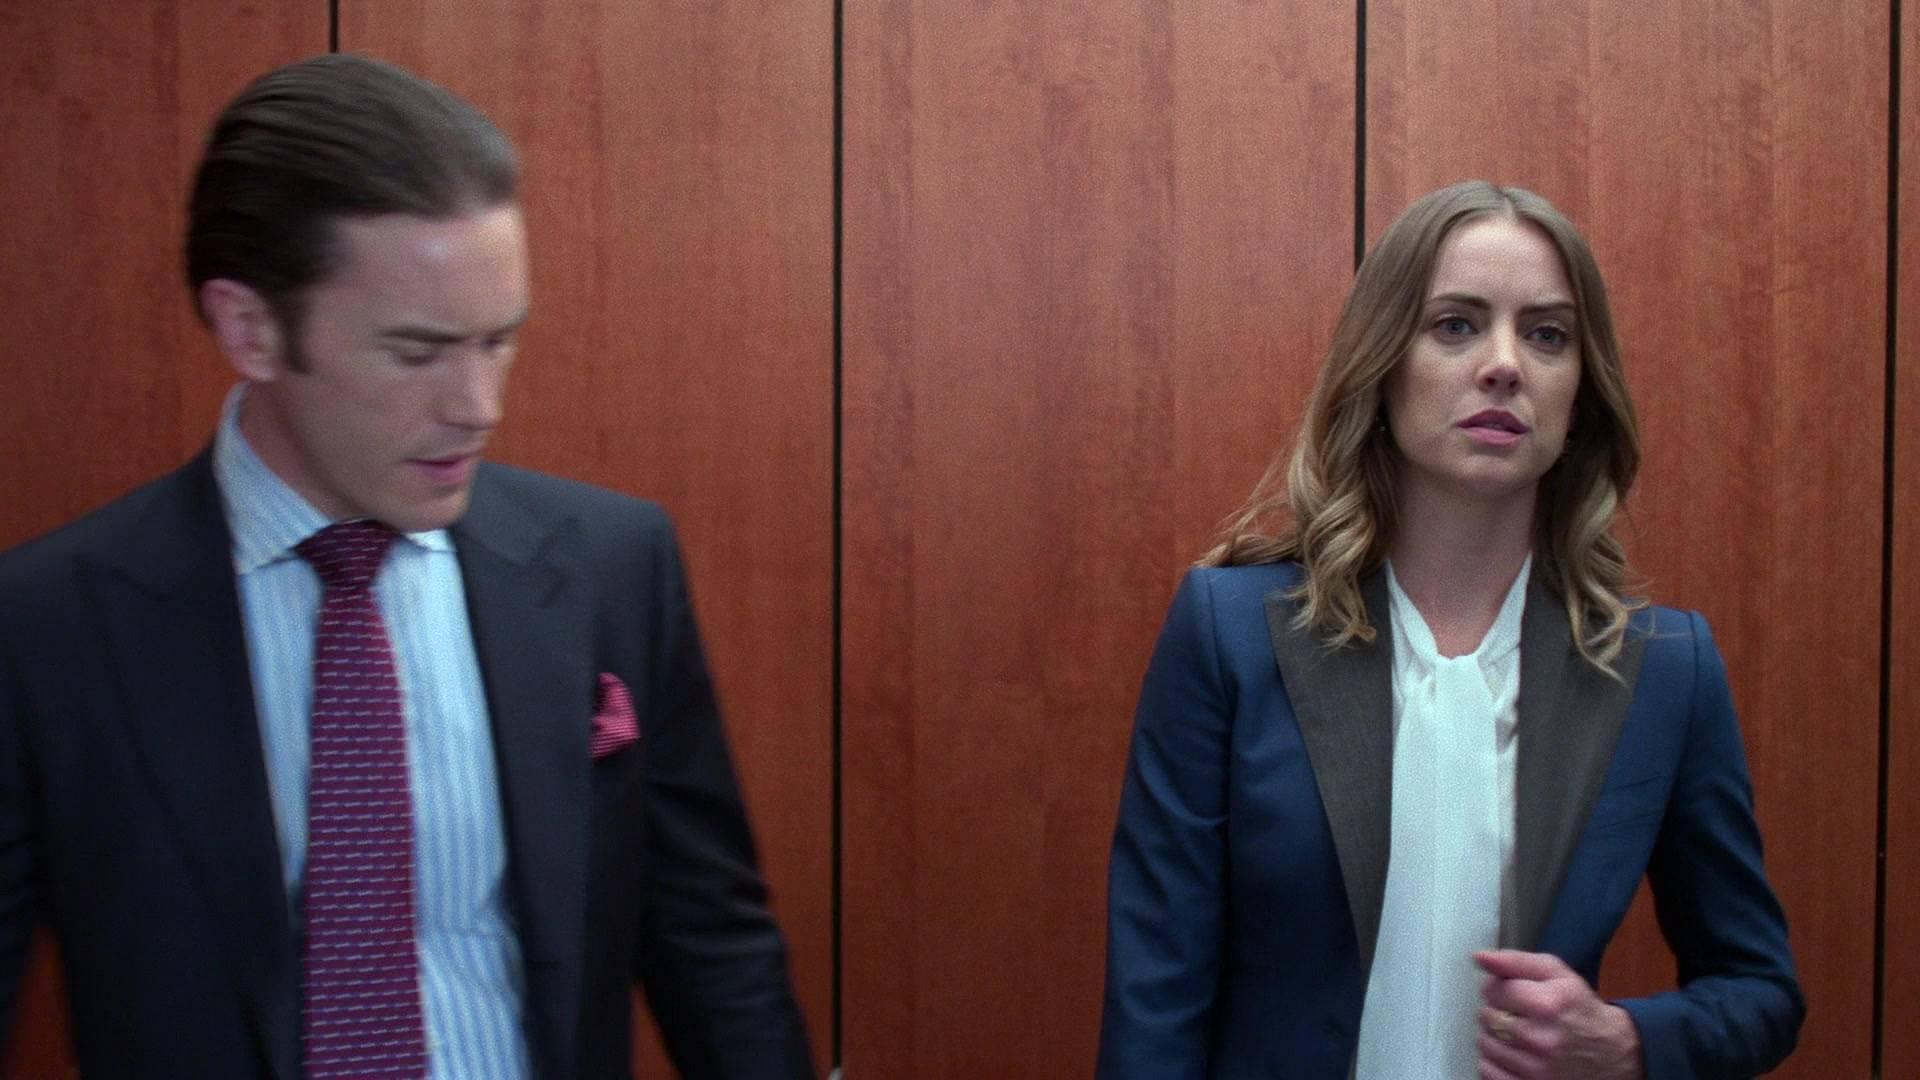 Marvel's Iron Fist S01E05